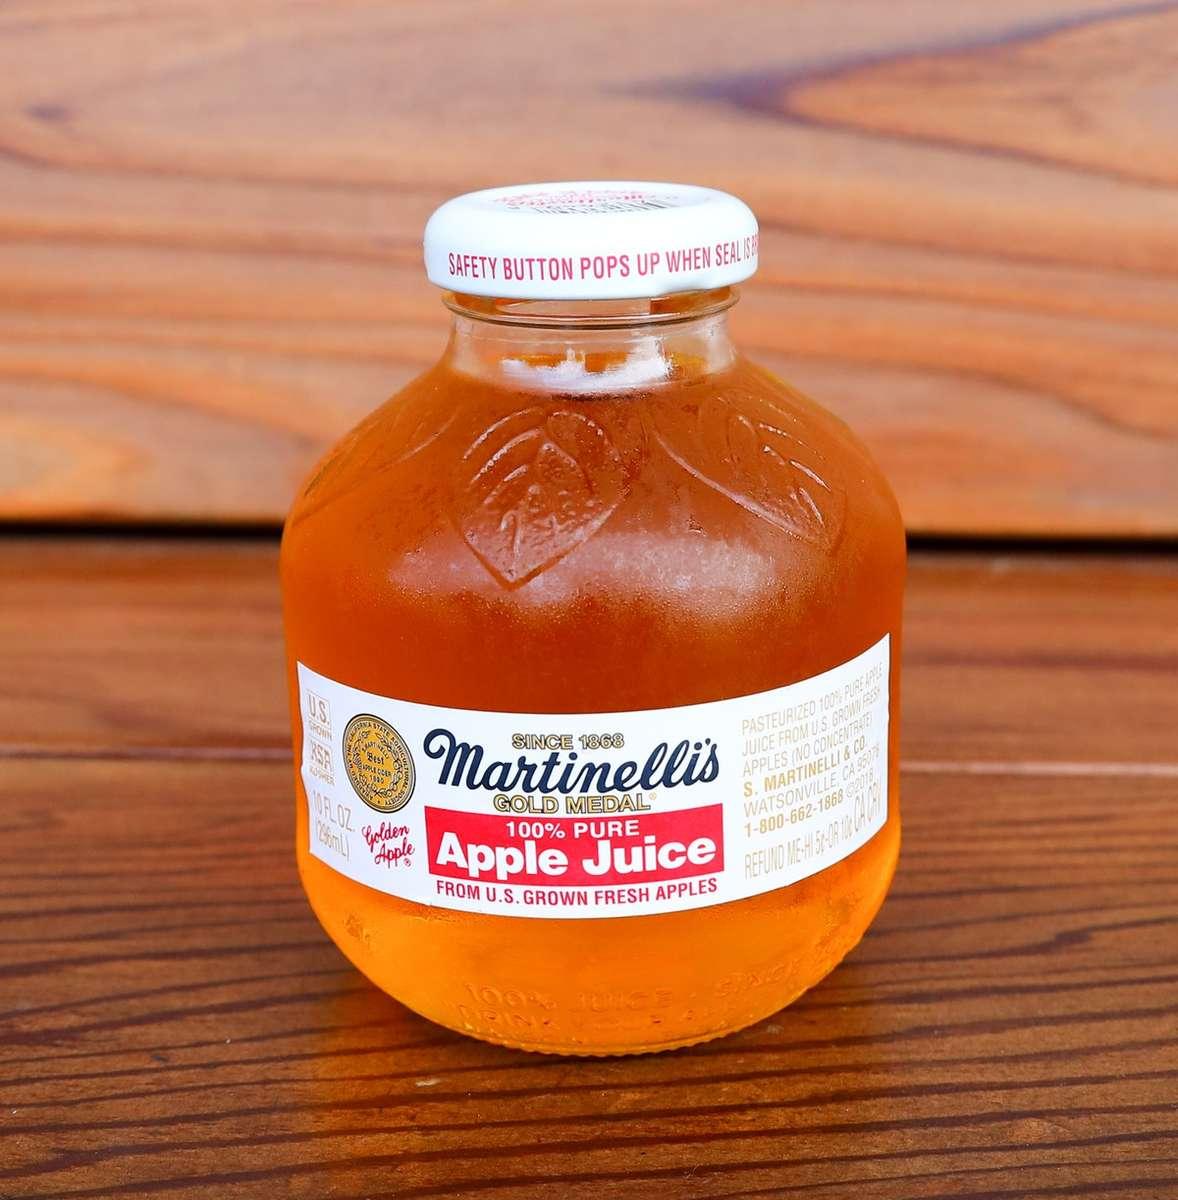 Martinelli Apple Juice